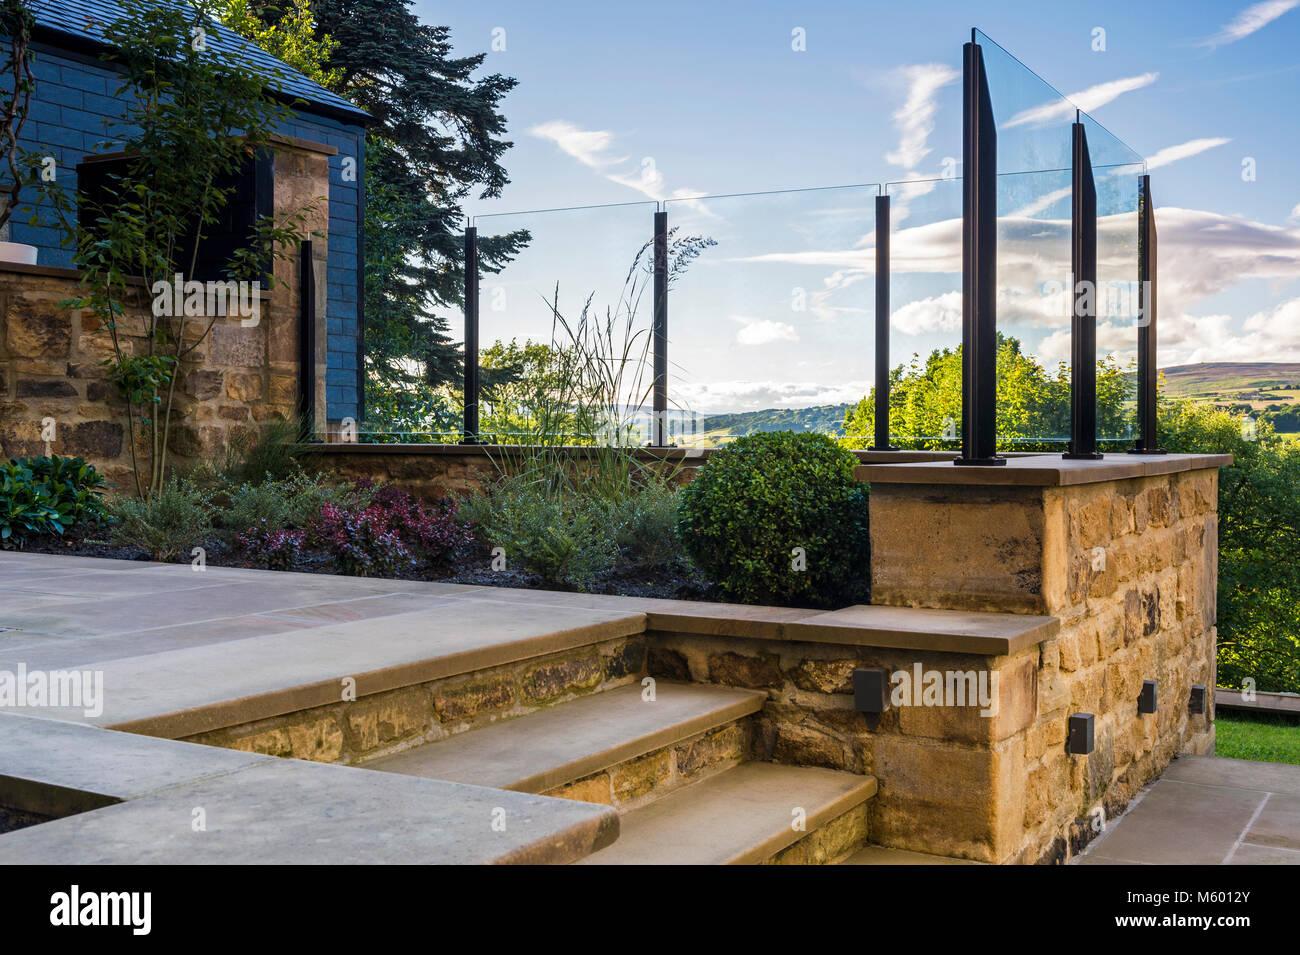 Coin de belle, paysagé, jardin privé (design contemporain, chemin ...